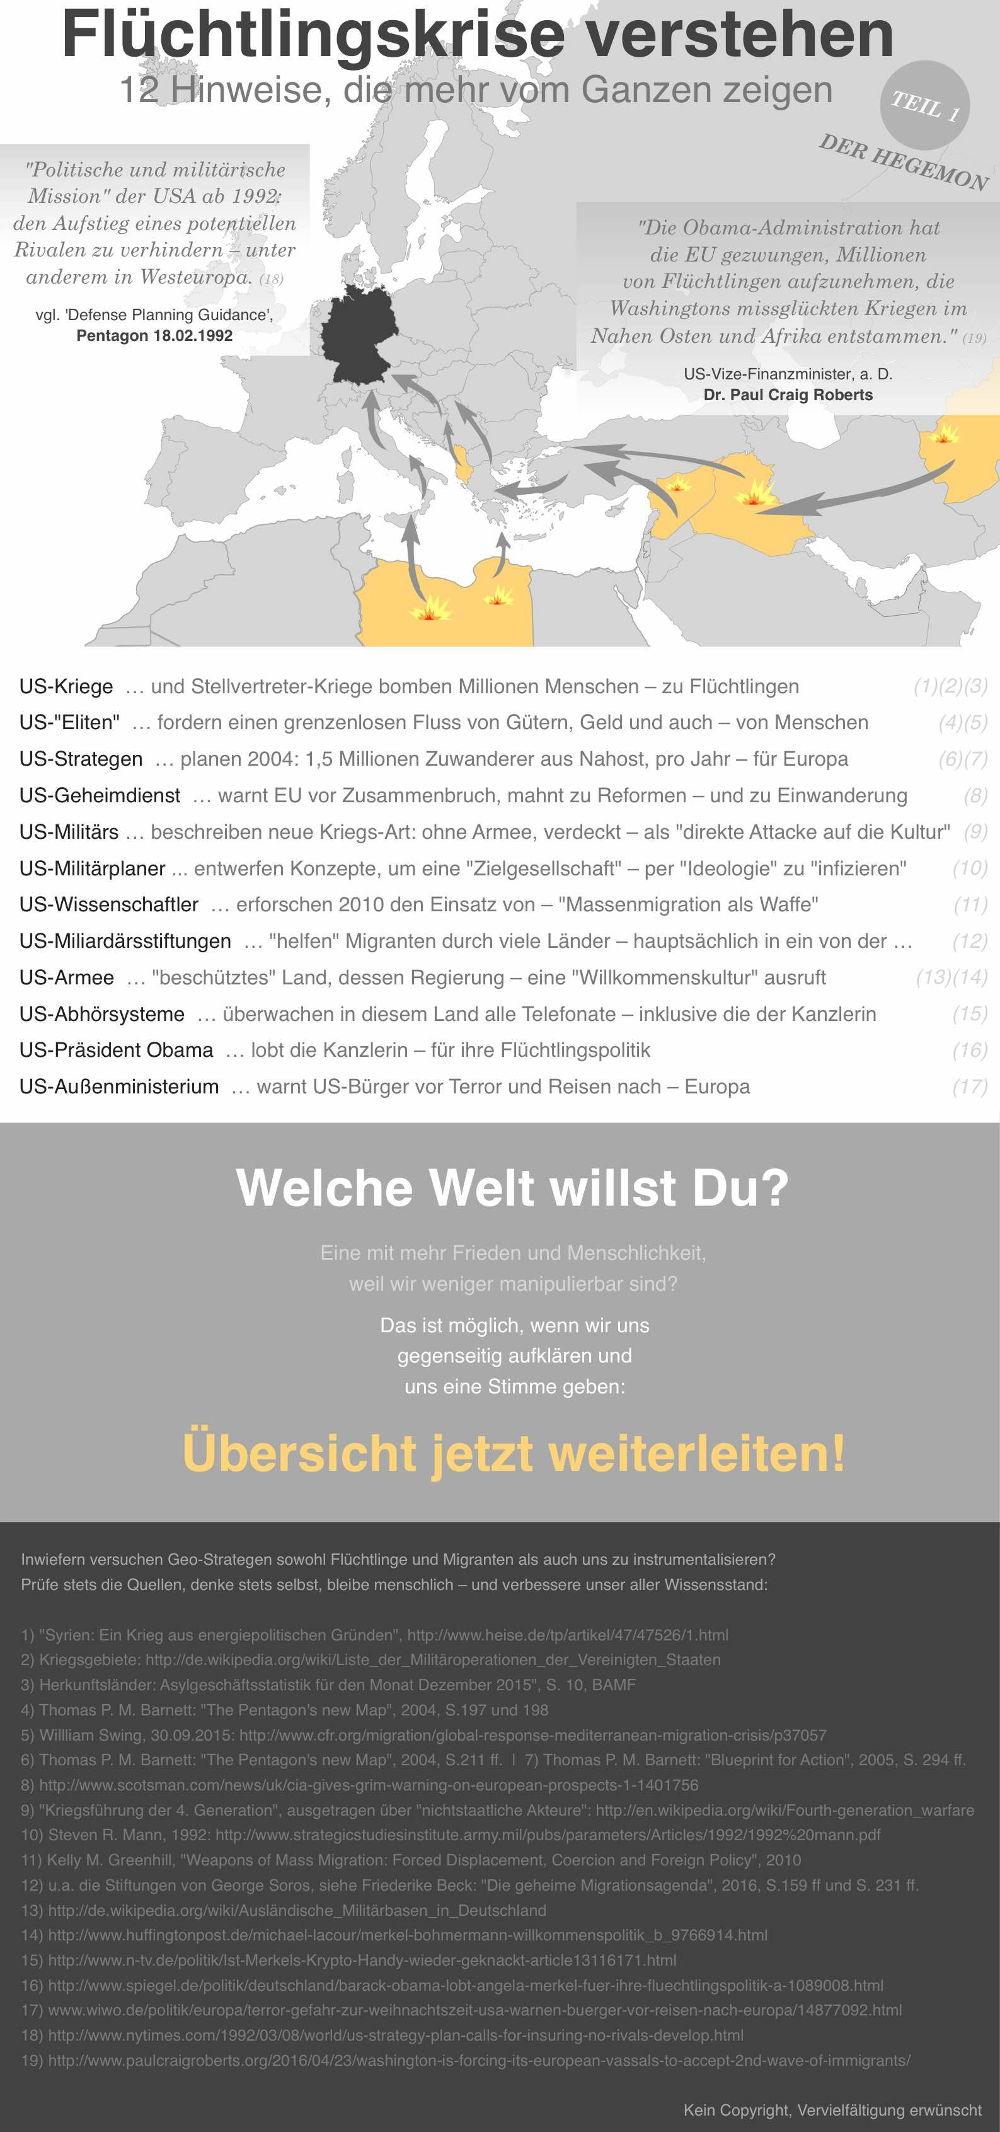 Infografik – Flüchtlingskrise verstehen 2 – Bildquelle: unbekannt, CC BY-NC-SA-Lizenz